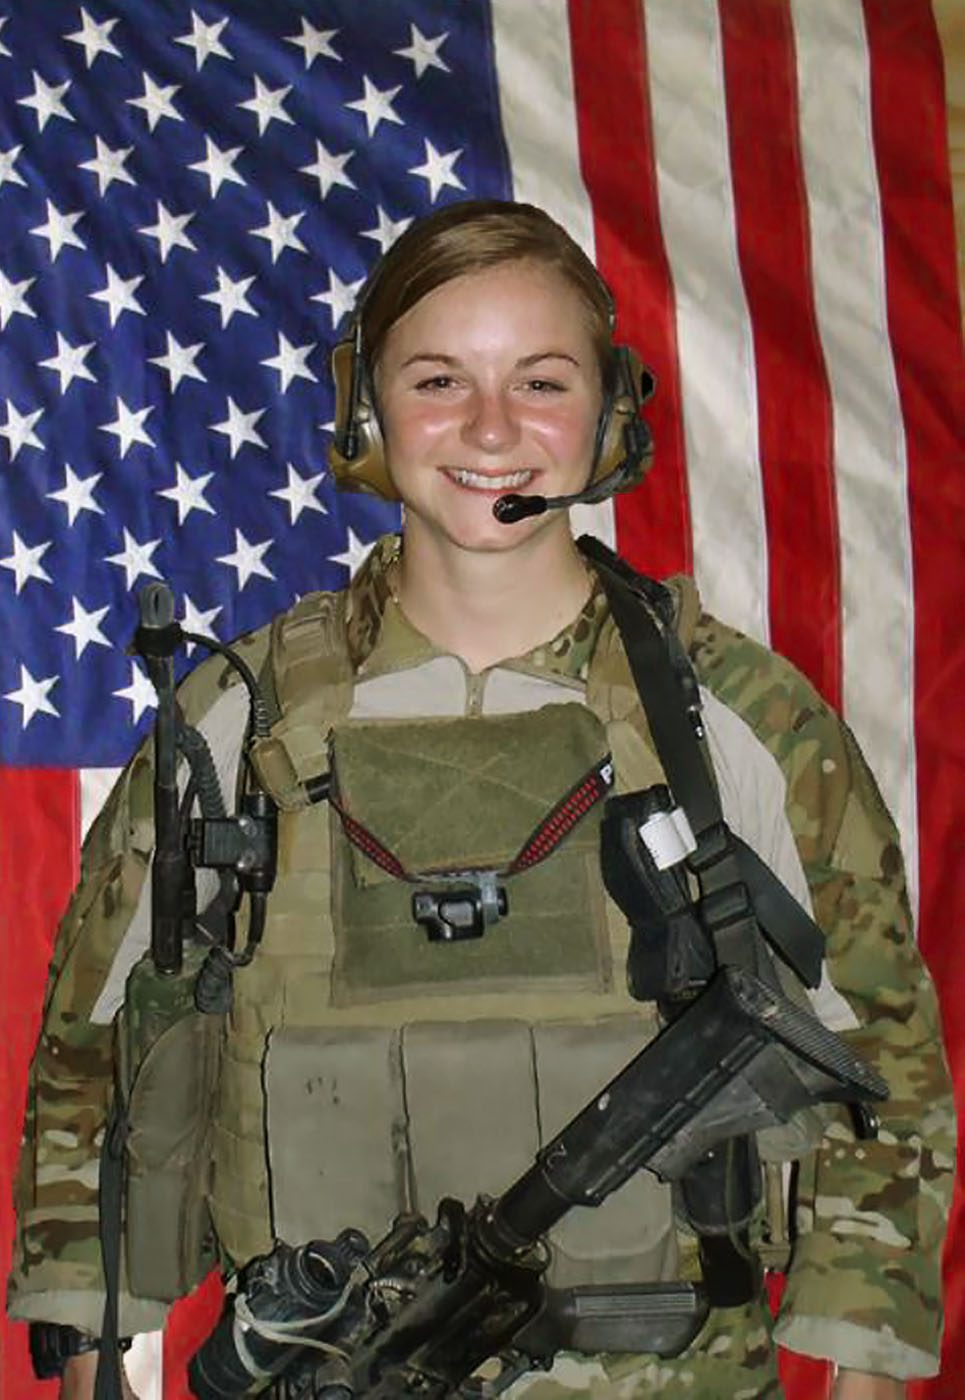 U.S. Army First Lieutenant Ashley White, 24, of Alliance, Ohio